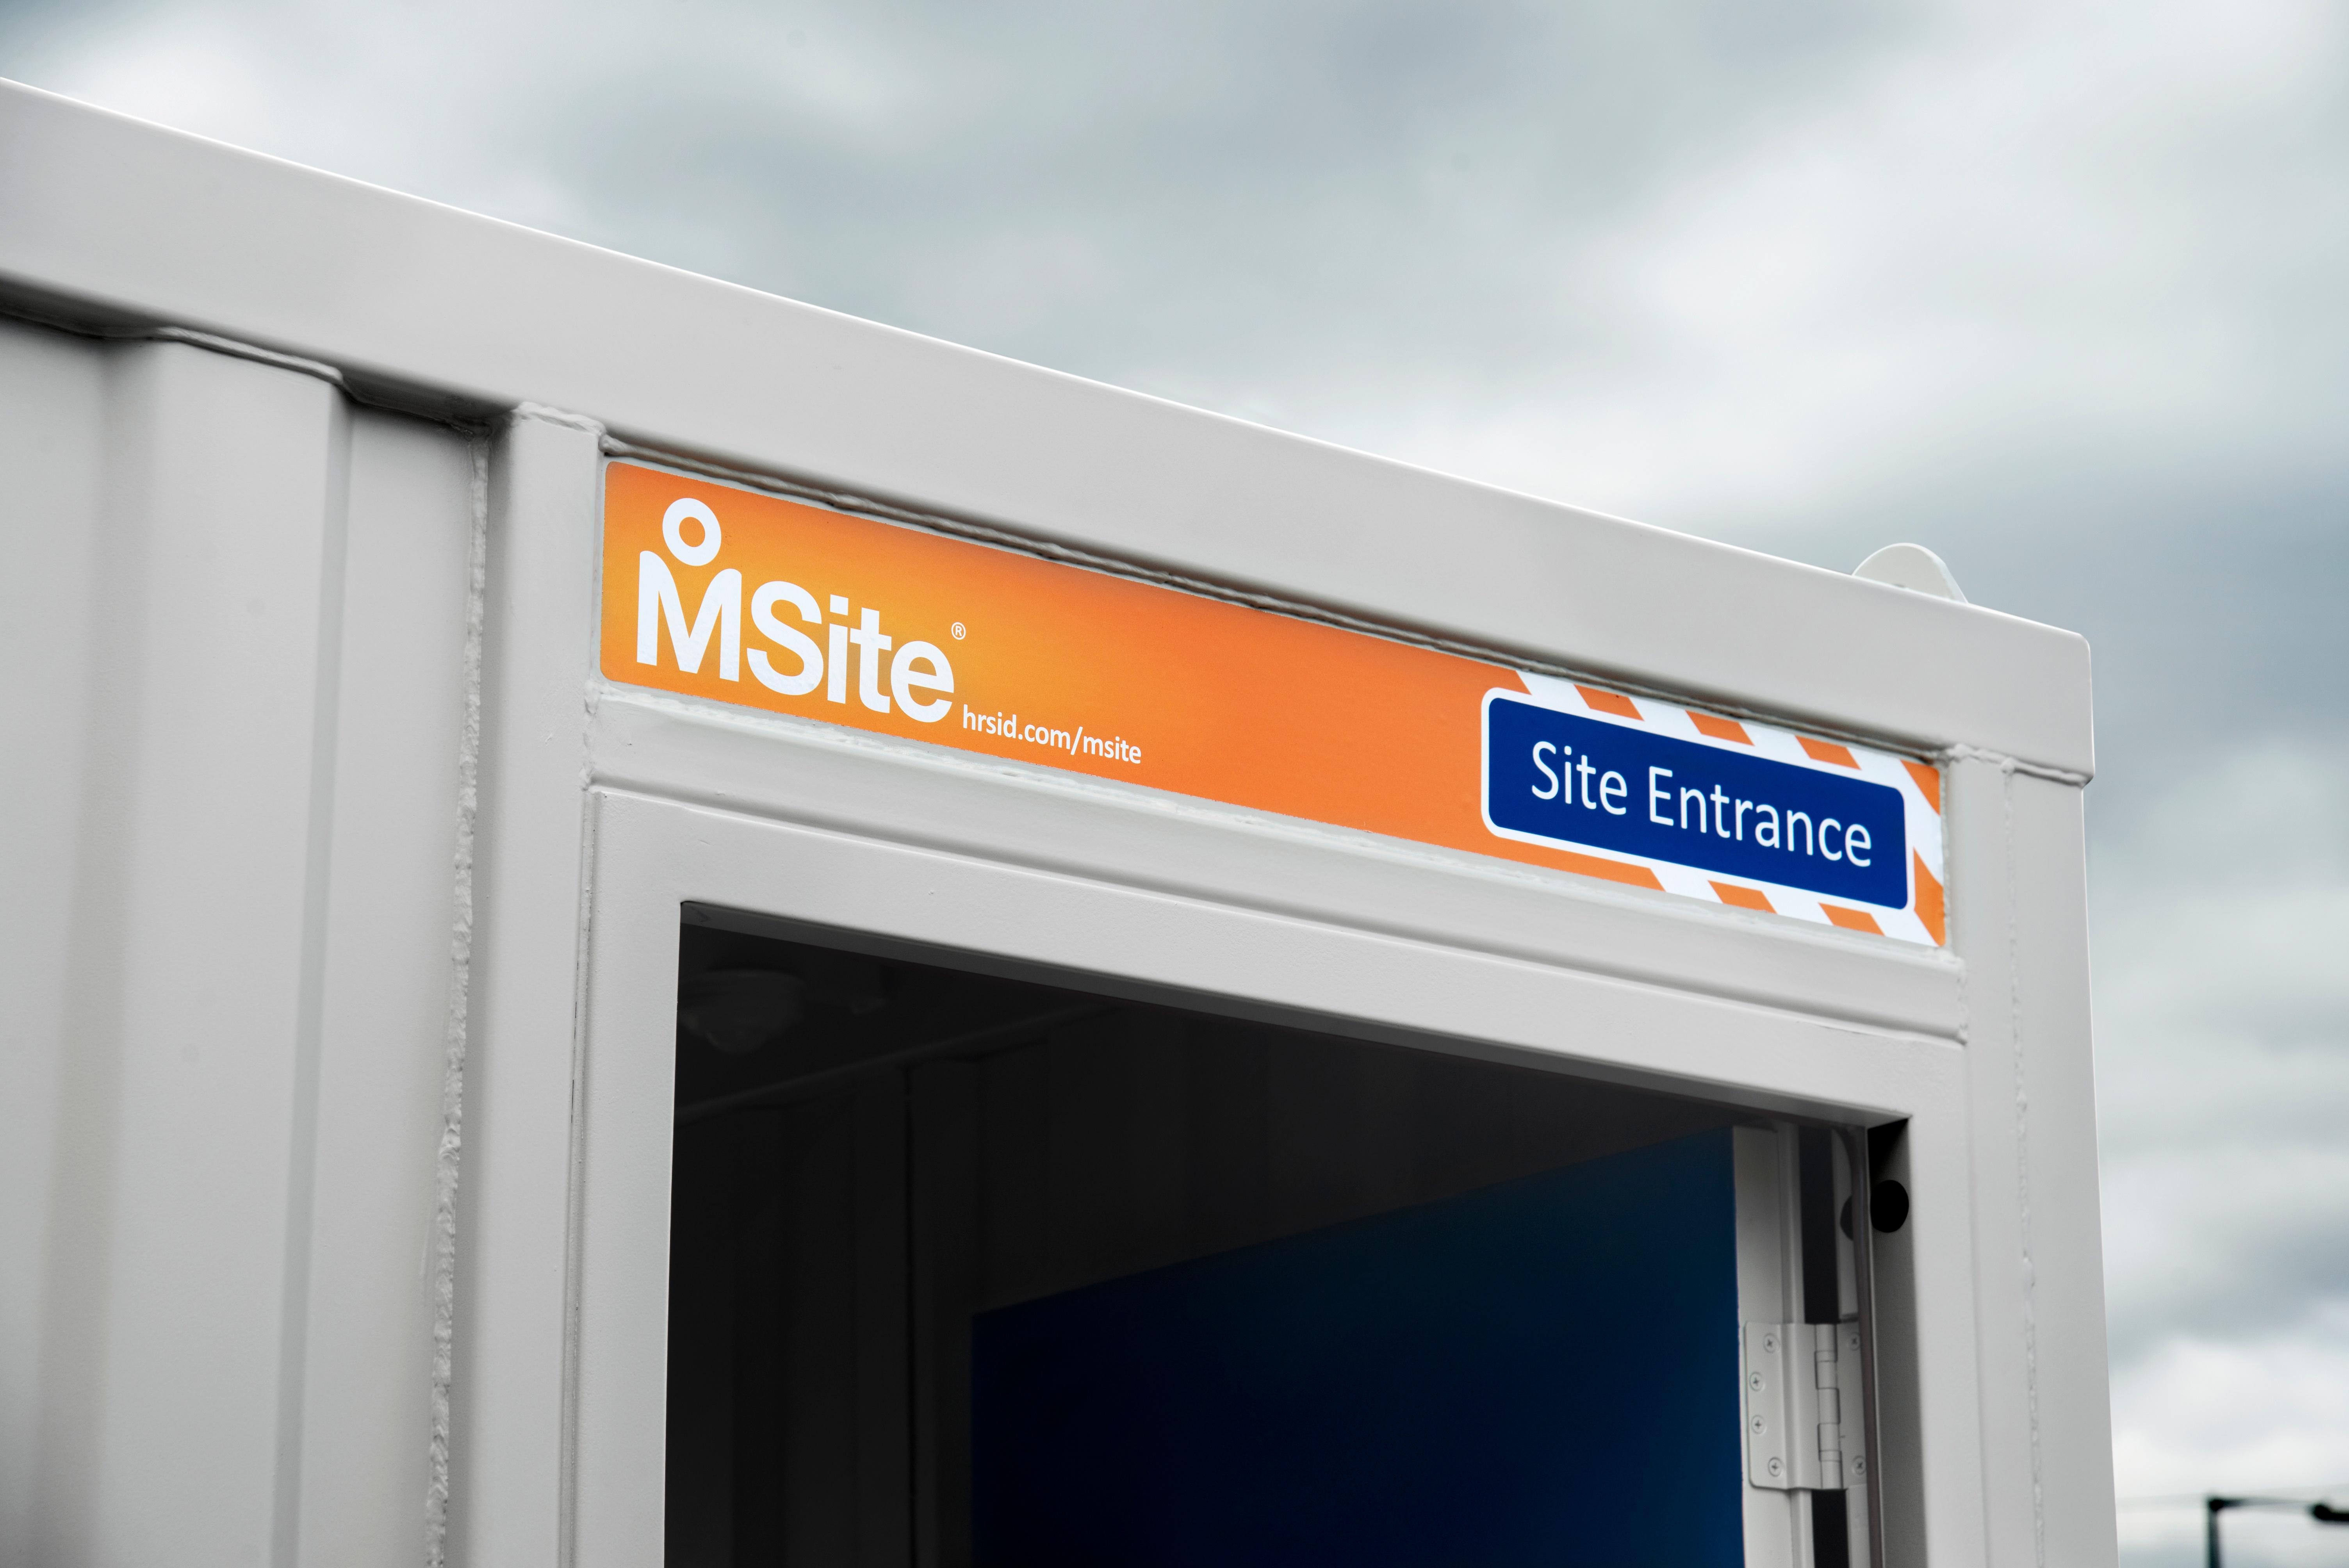 MSite-access-control-turnstile-pod.jpg